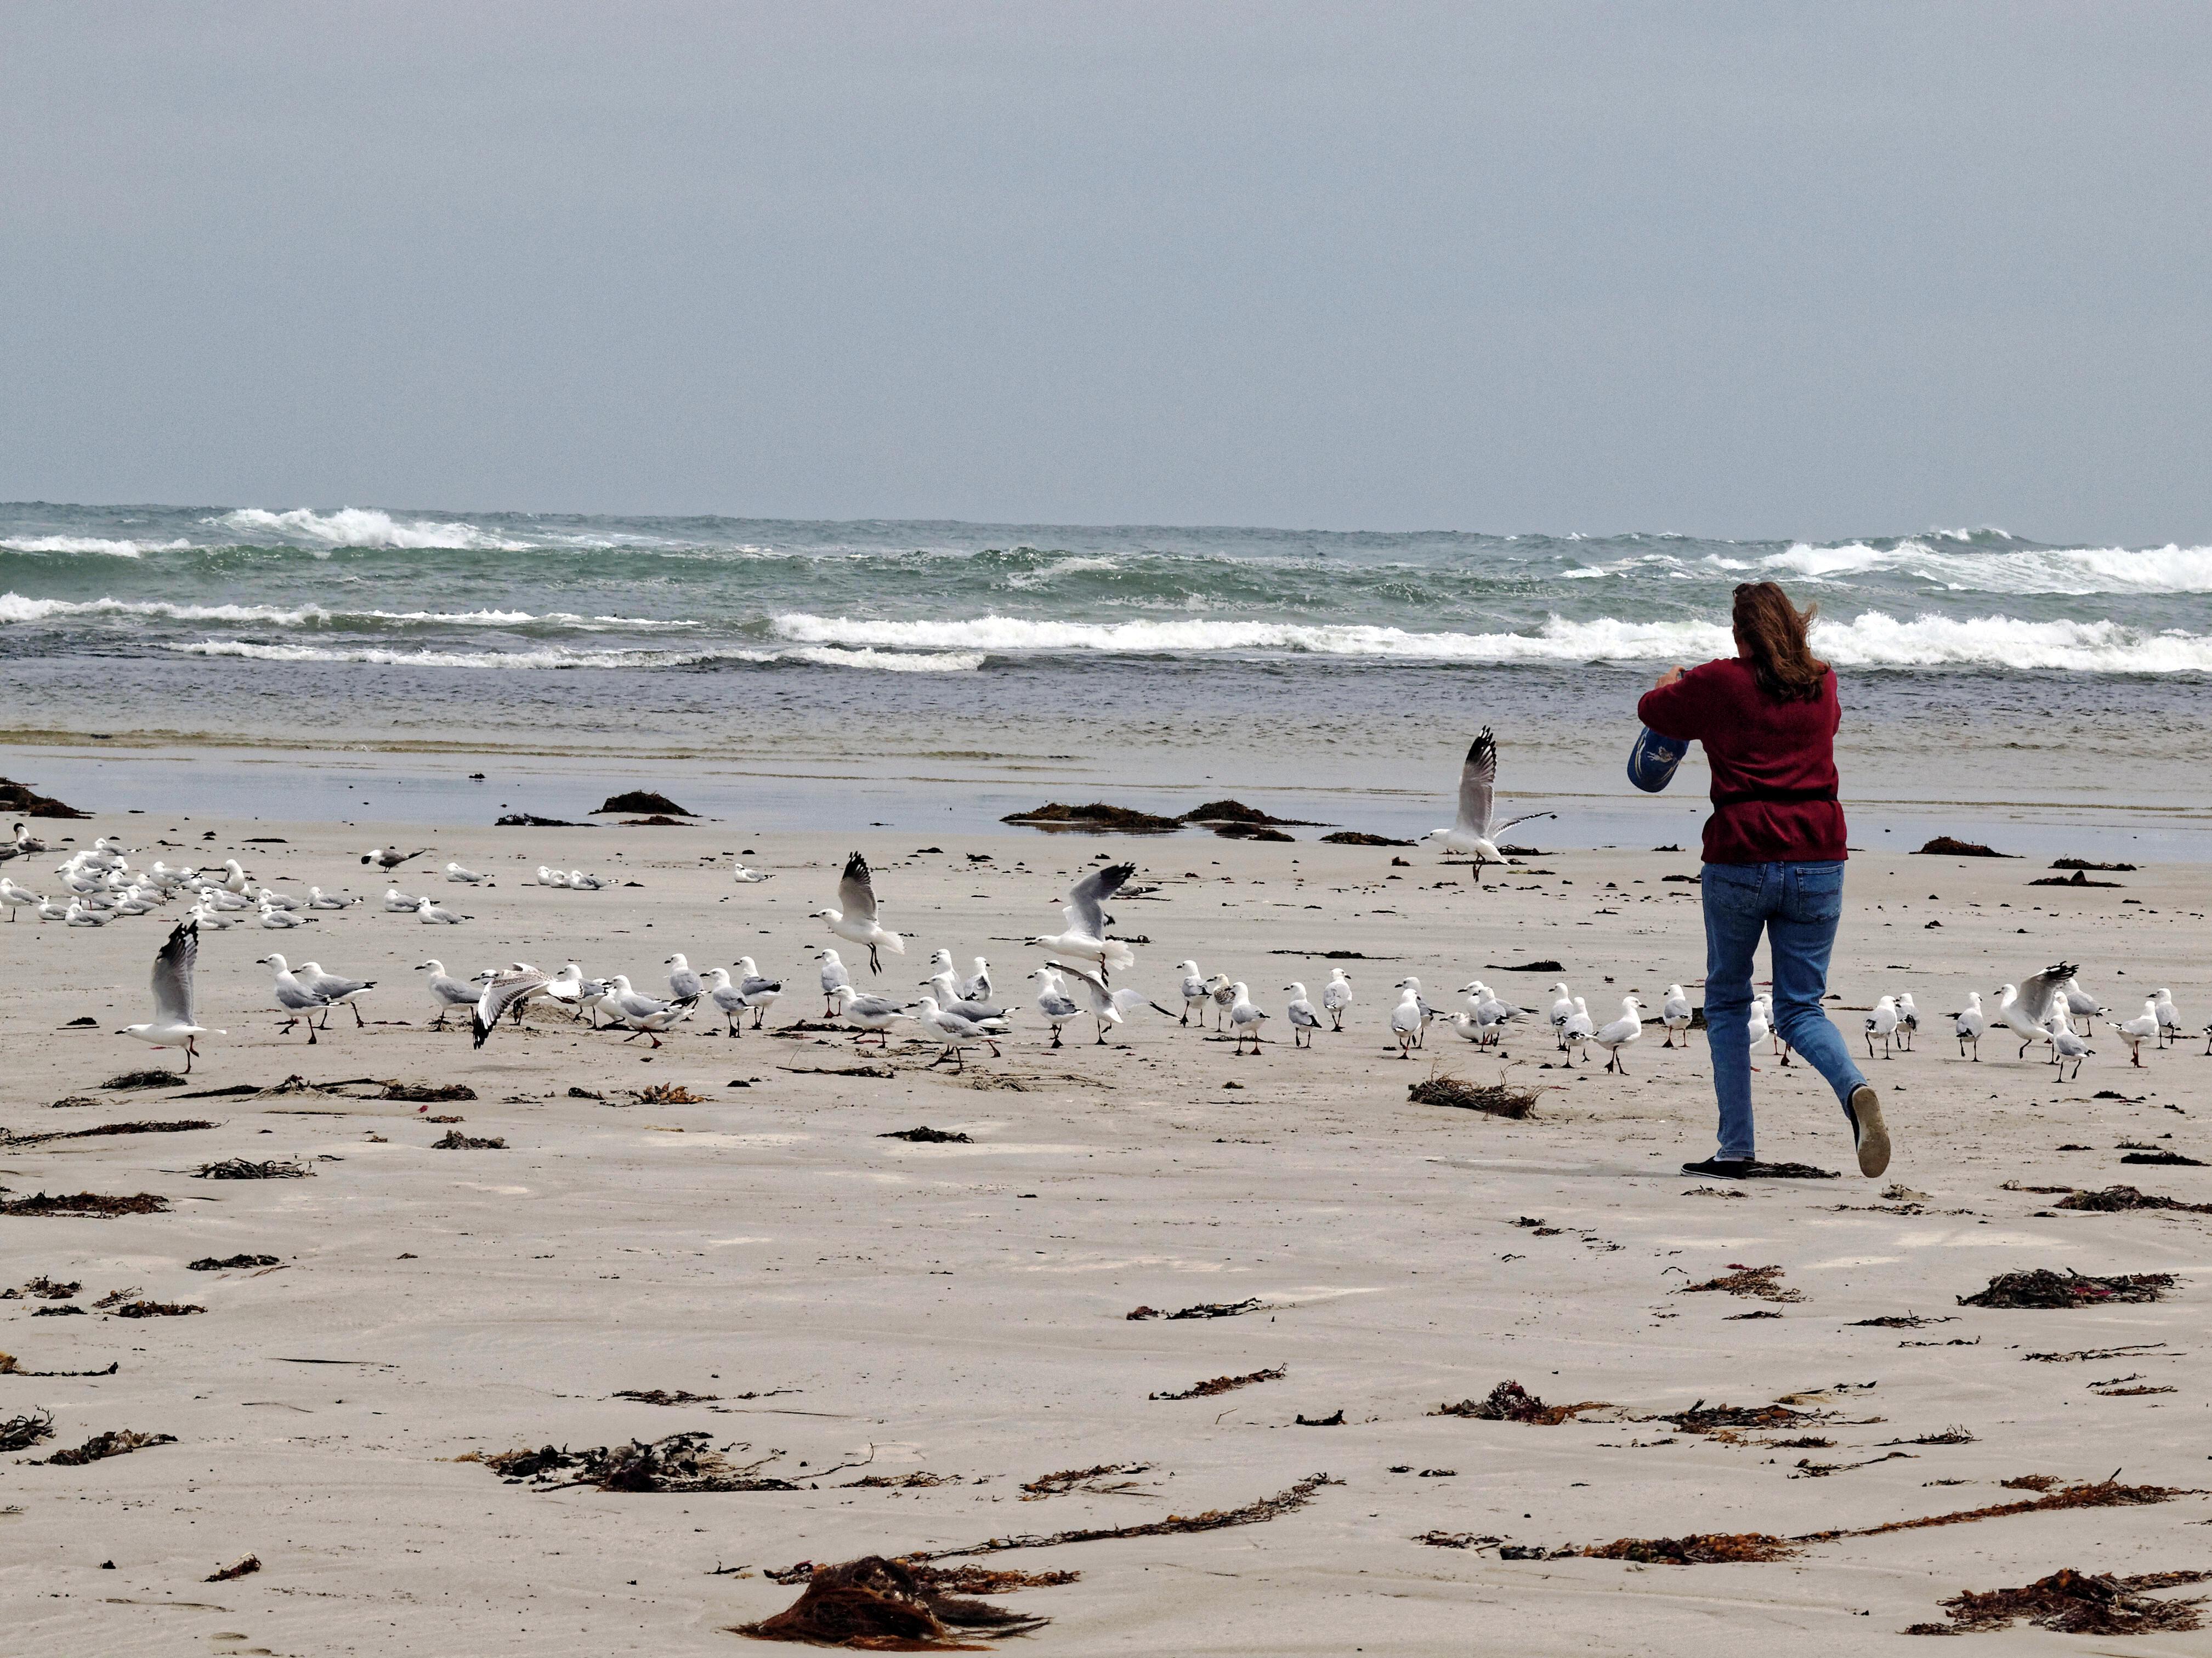 Yvonne-Seagulls-6.jpeg